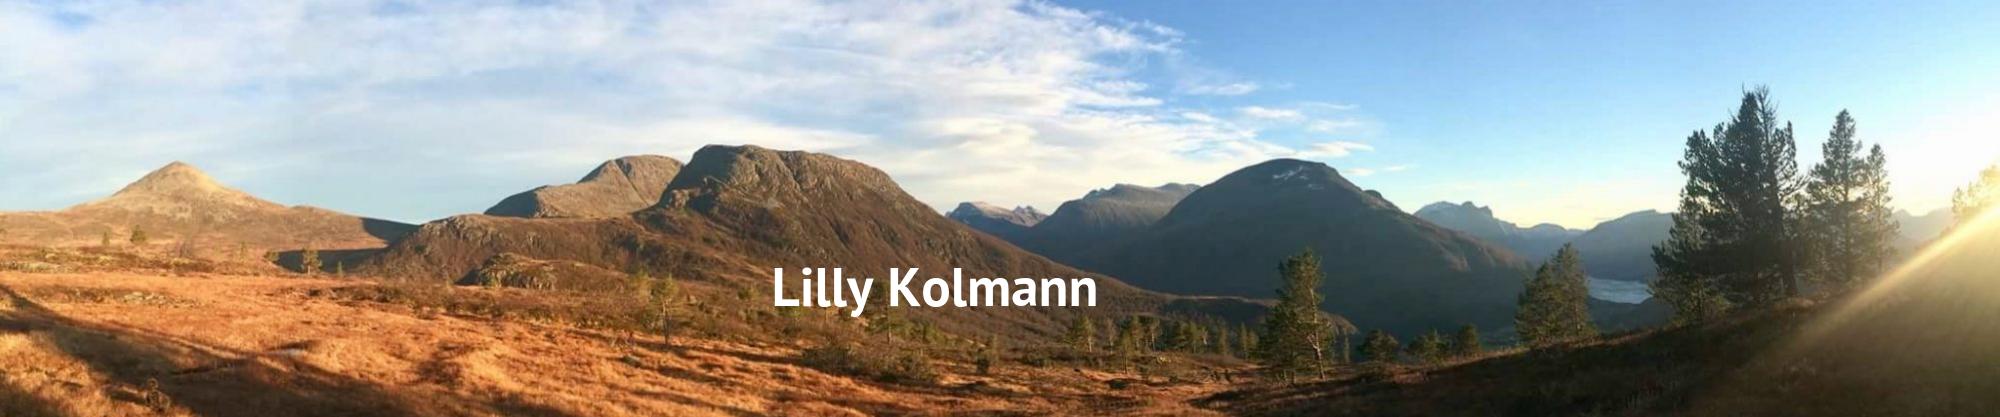 Lilly Kolmann